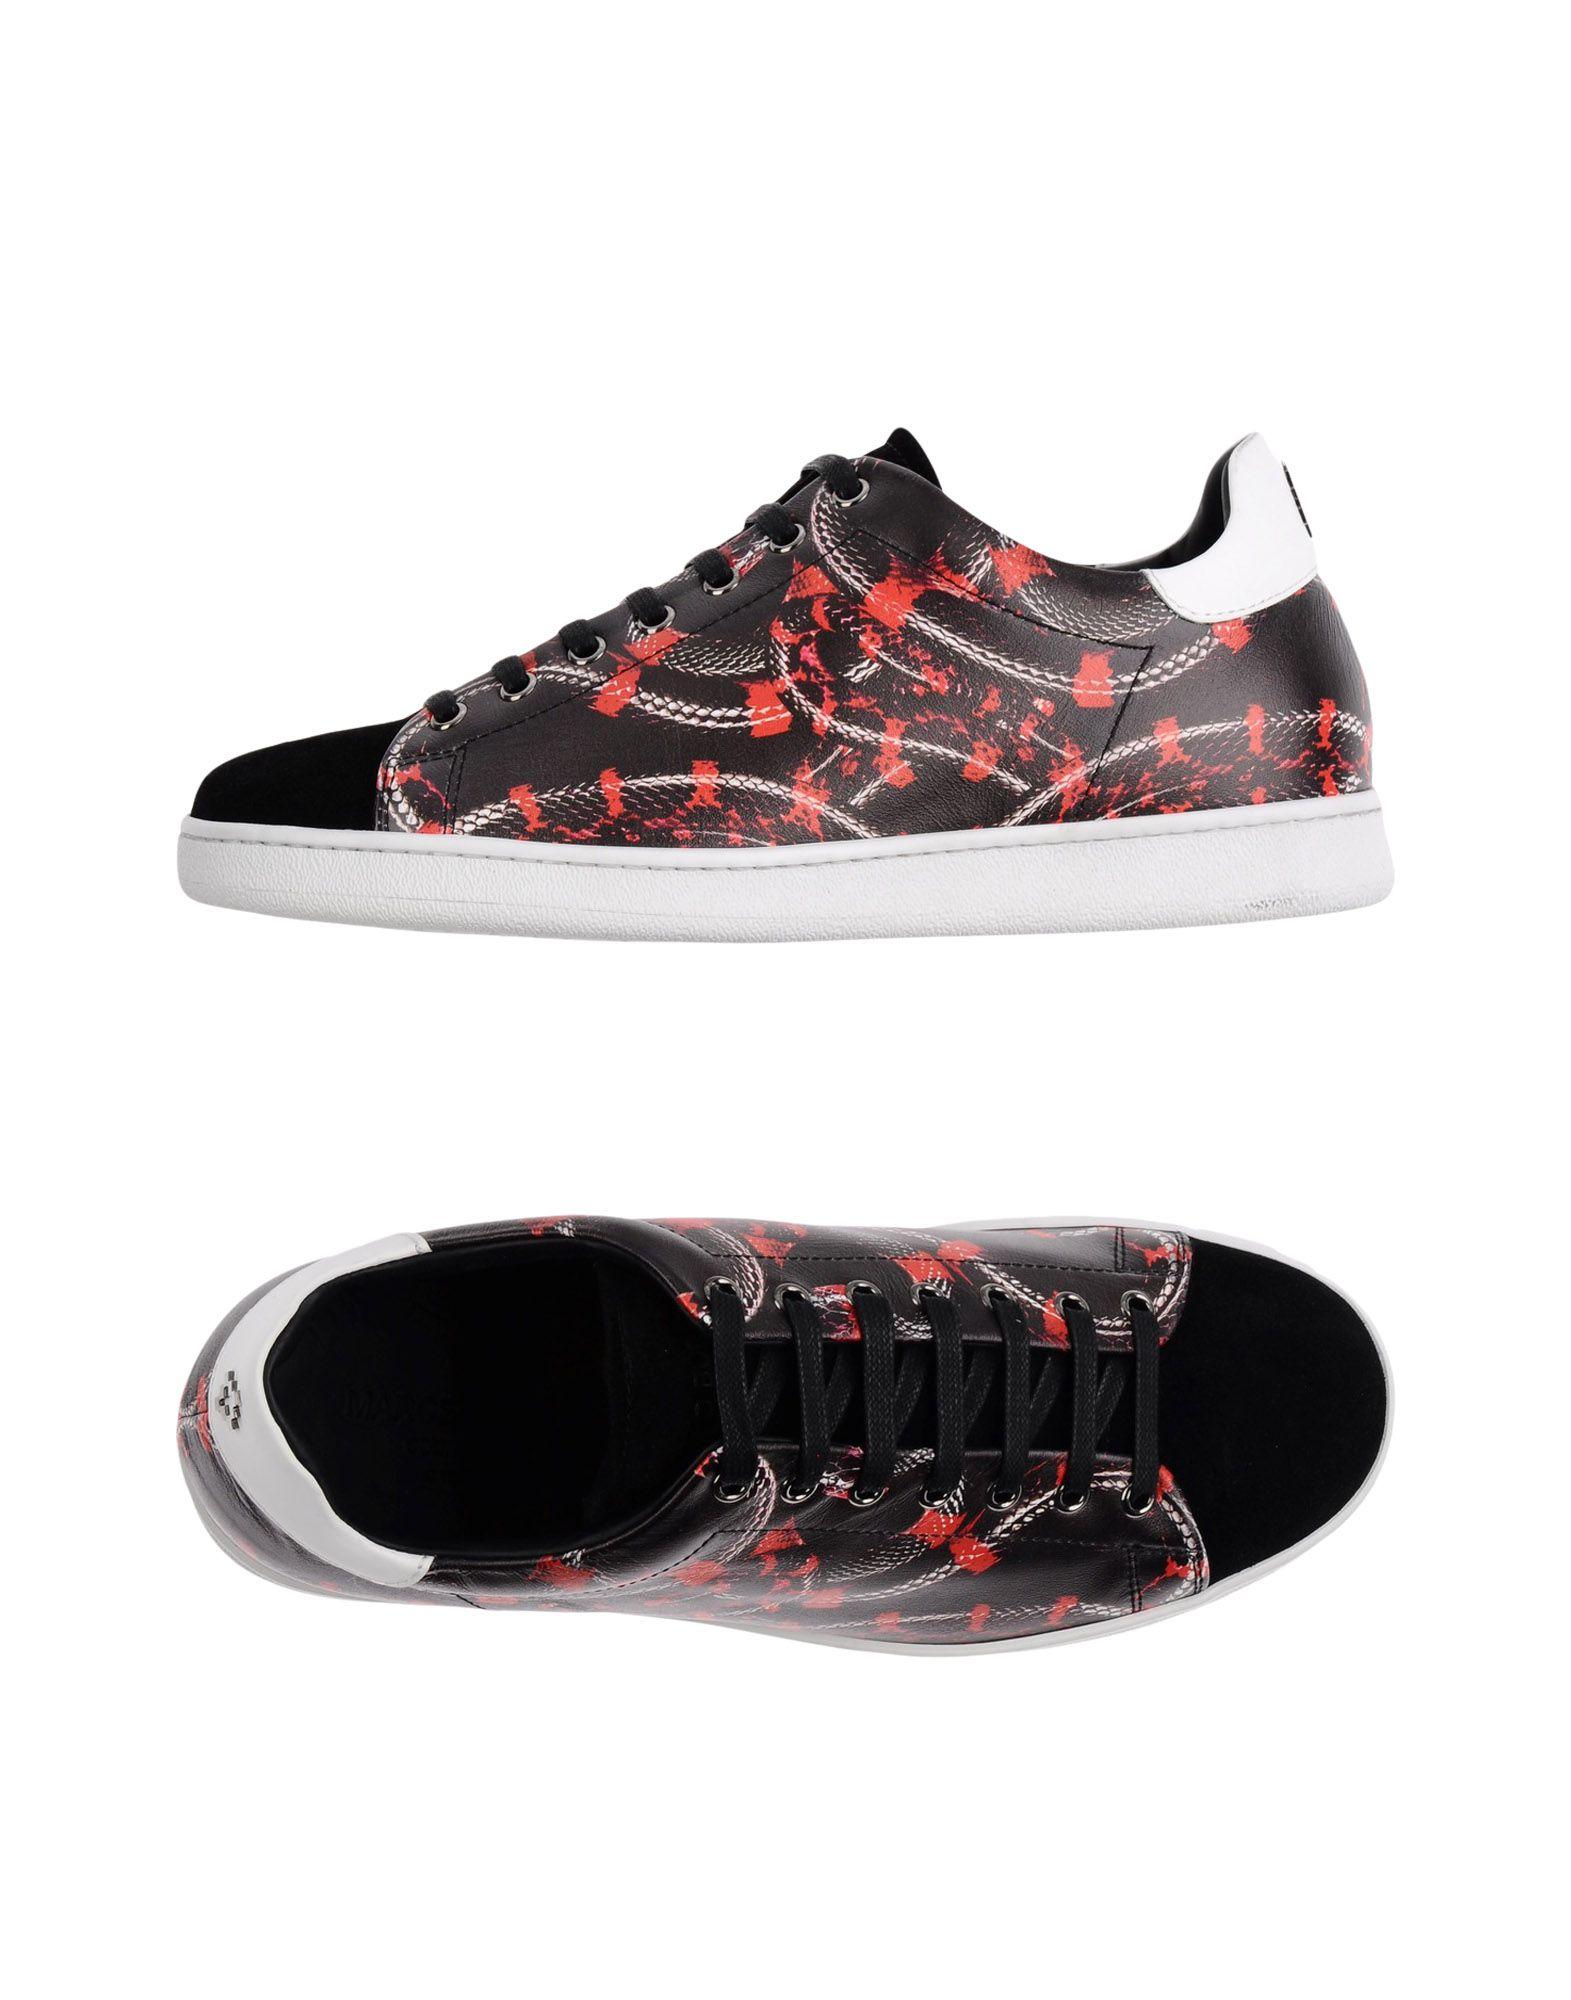 Sneakers Marcelo Burlon Homme - Sneakers Marcelo Burlon sur